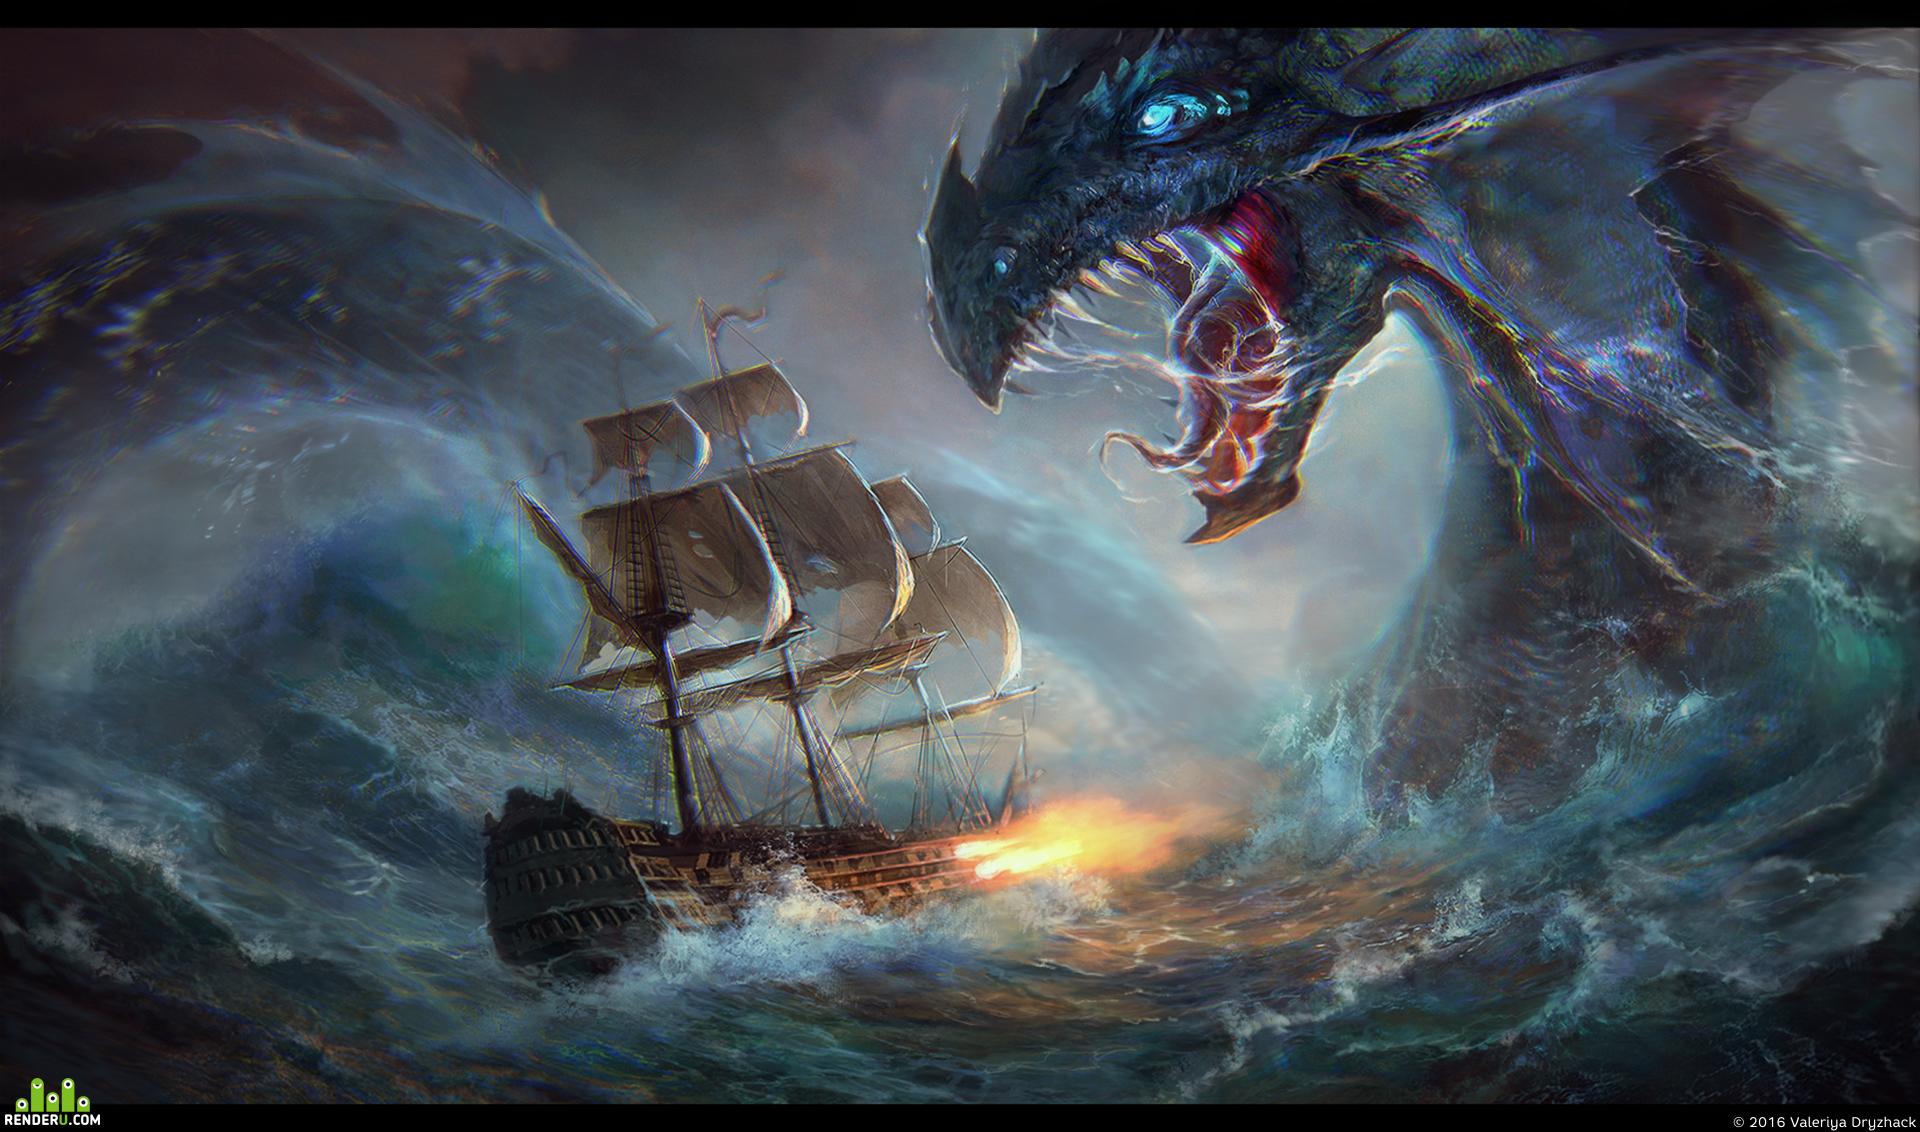 preview Dangerous sea